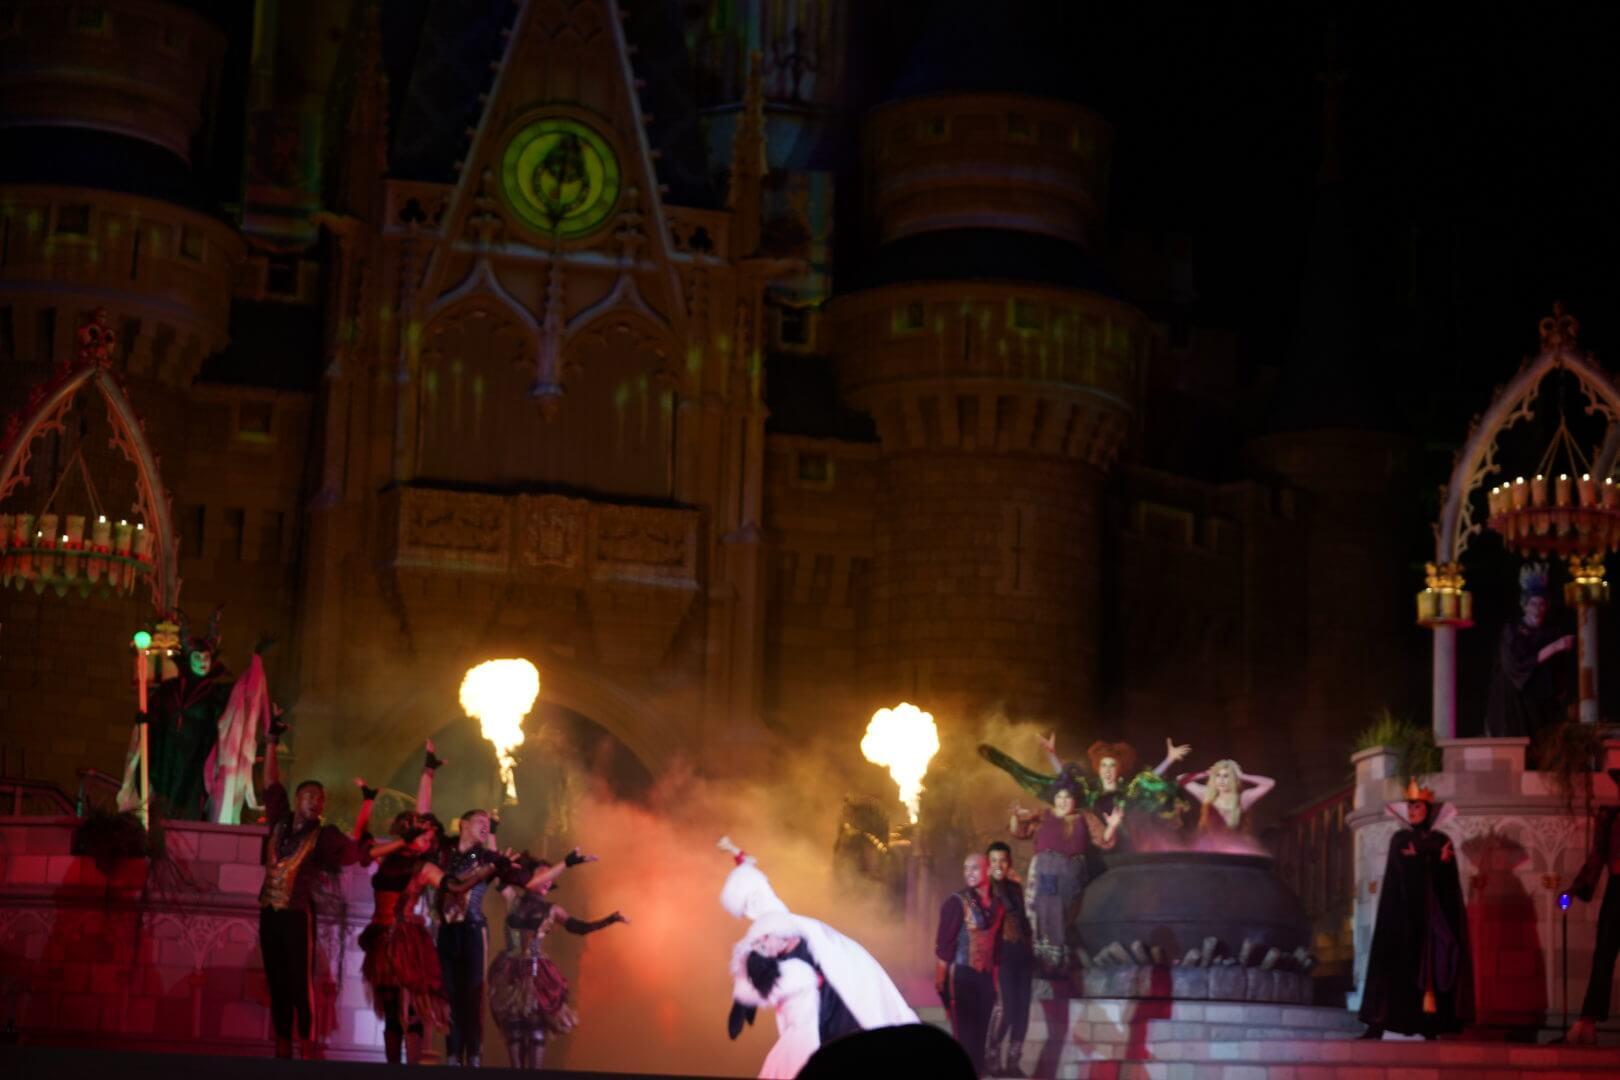 Cruella de Vil - Hocus Pocus Villain Spelltacular at Disney World